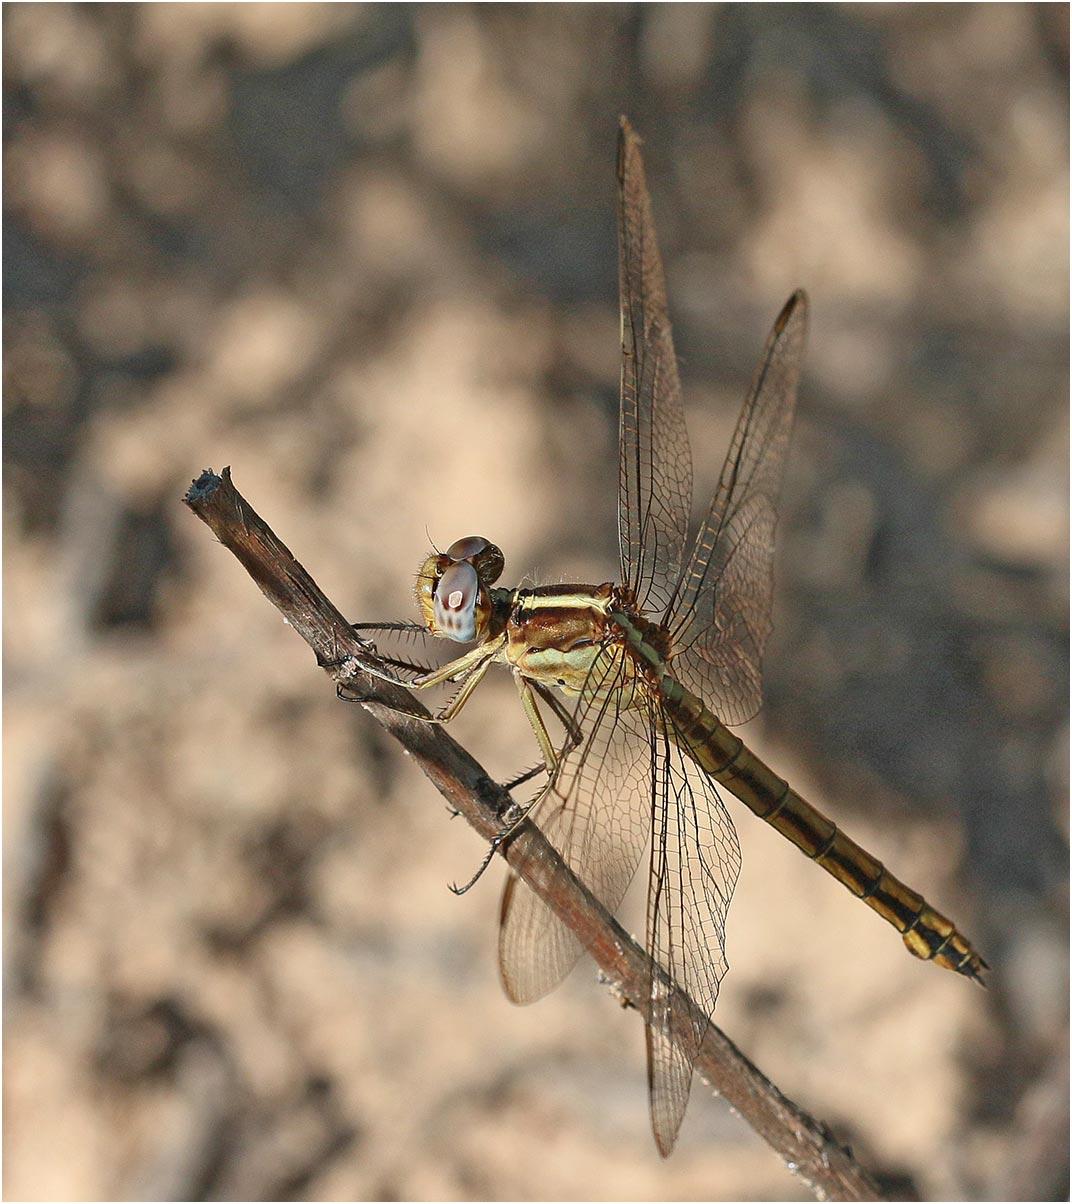 Nesciothemis farinosa femelle, Namibie, Rundu sur l'Okavango, 10/02/20